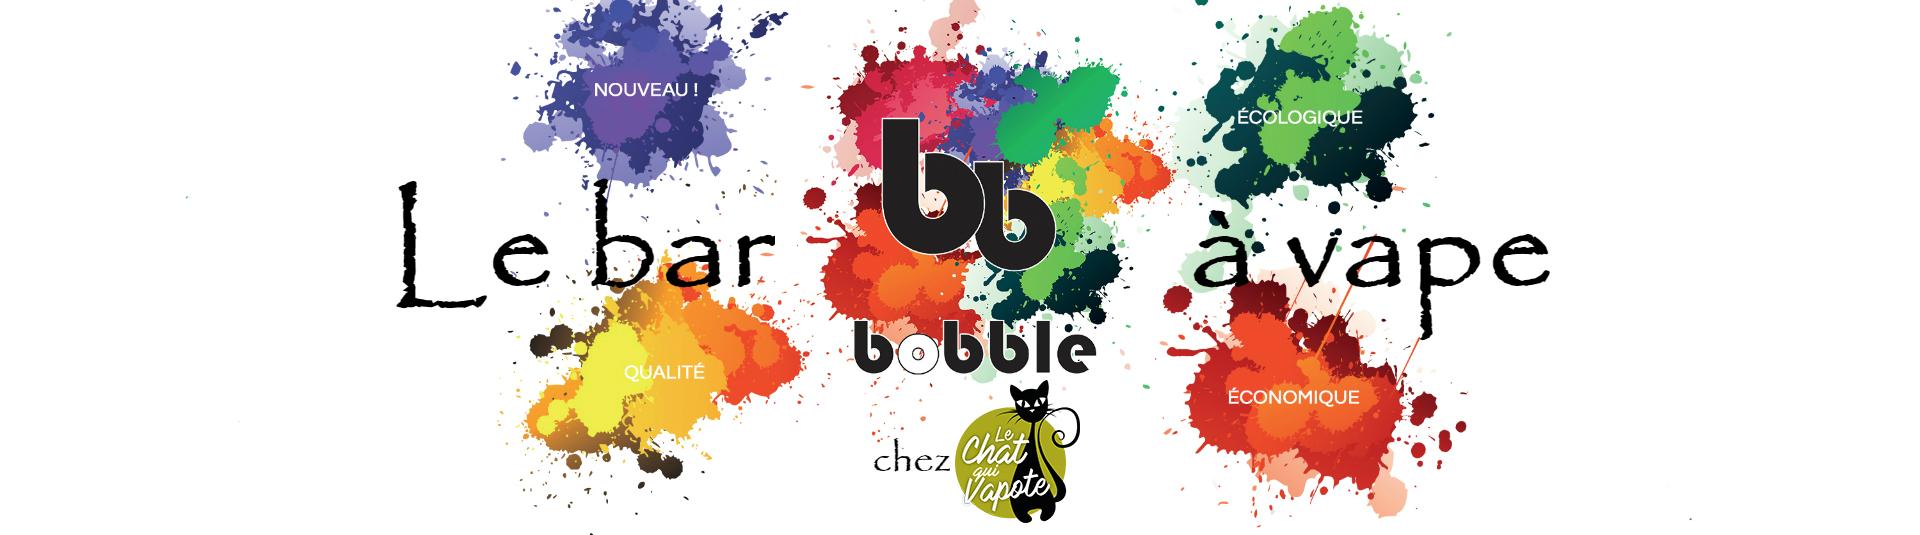 bobble-image-015